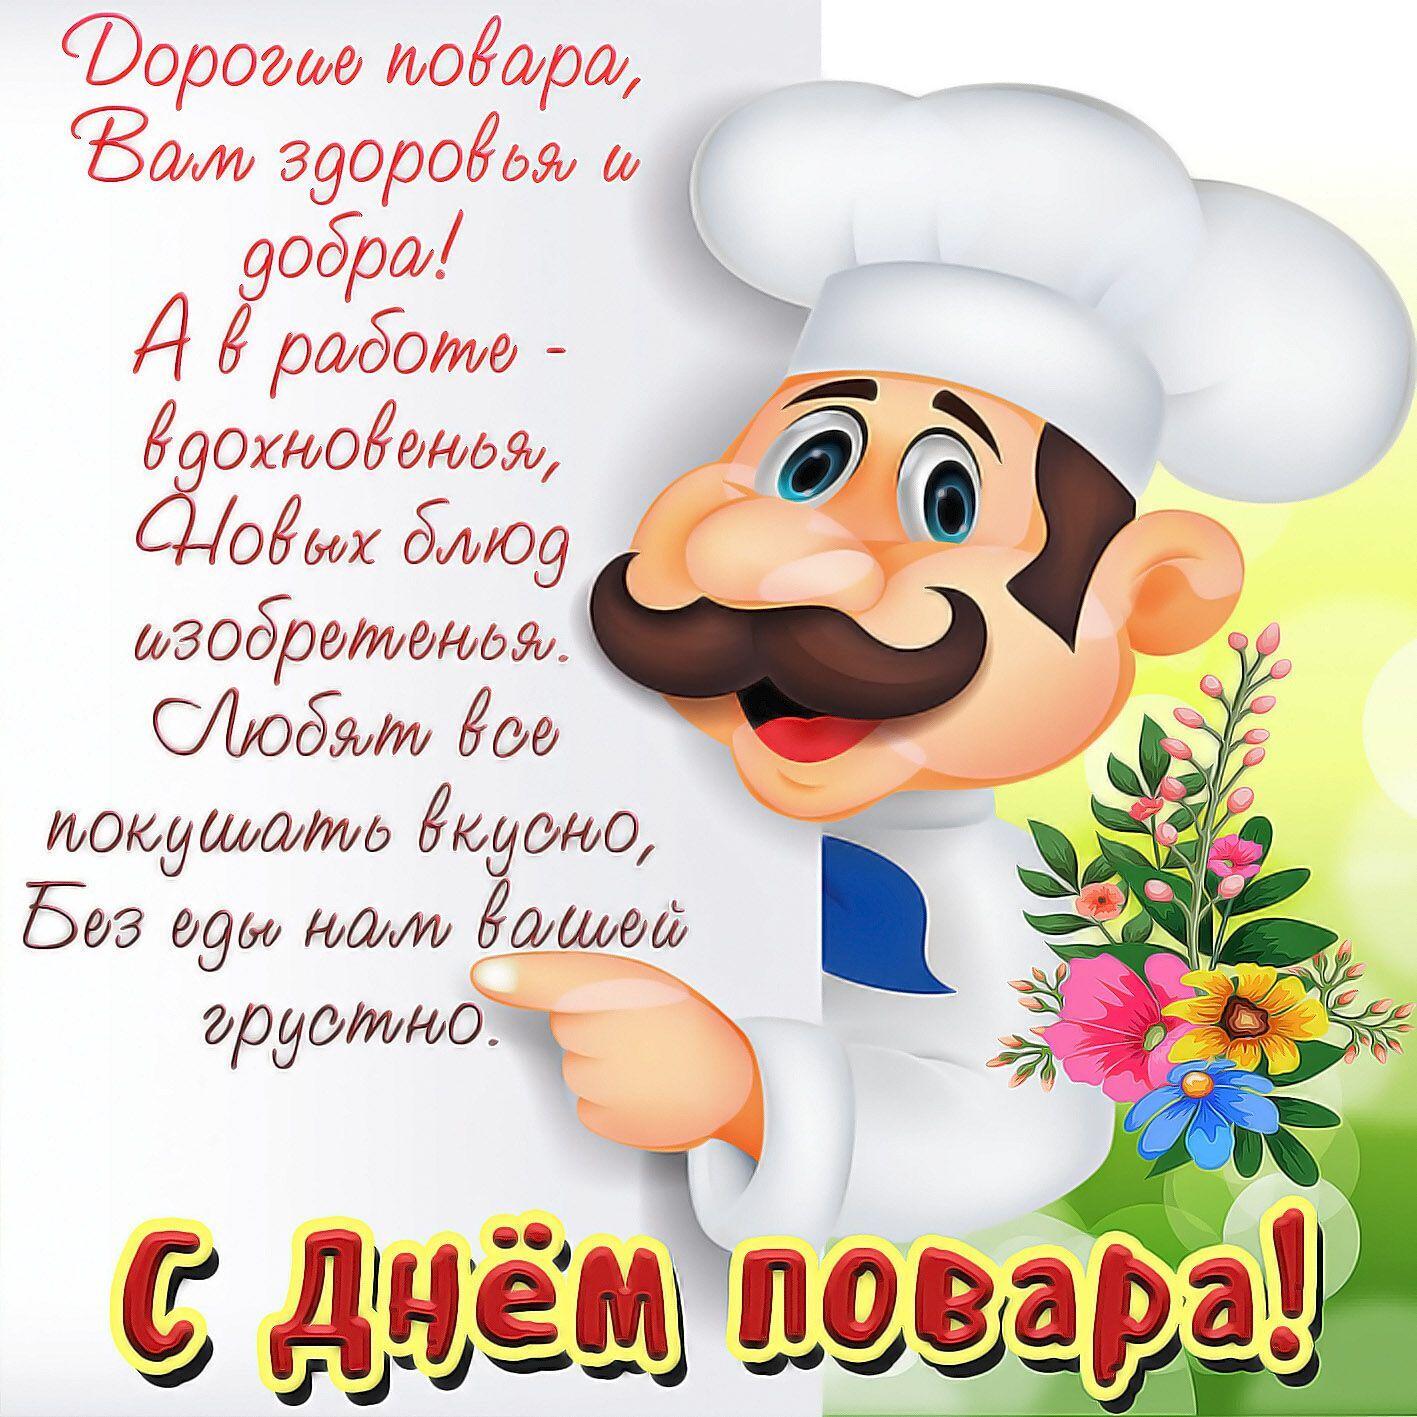 Побажання в День кухаря